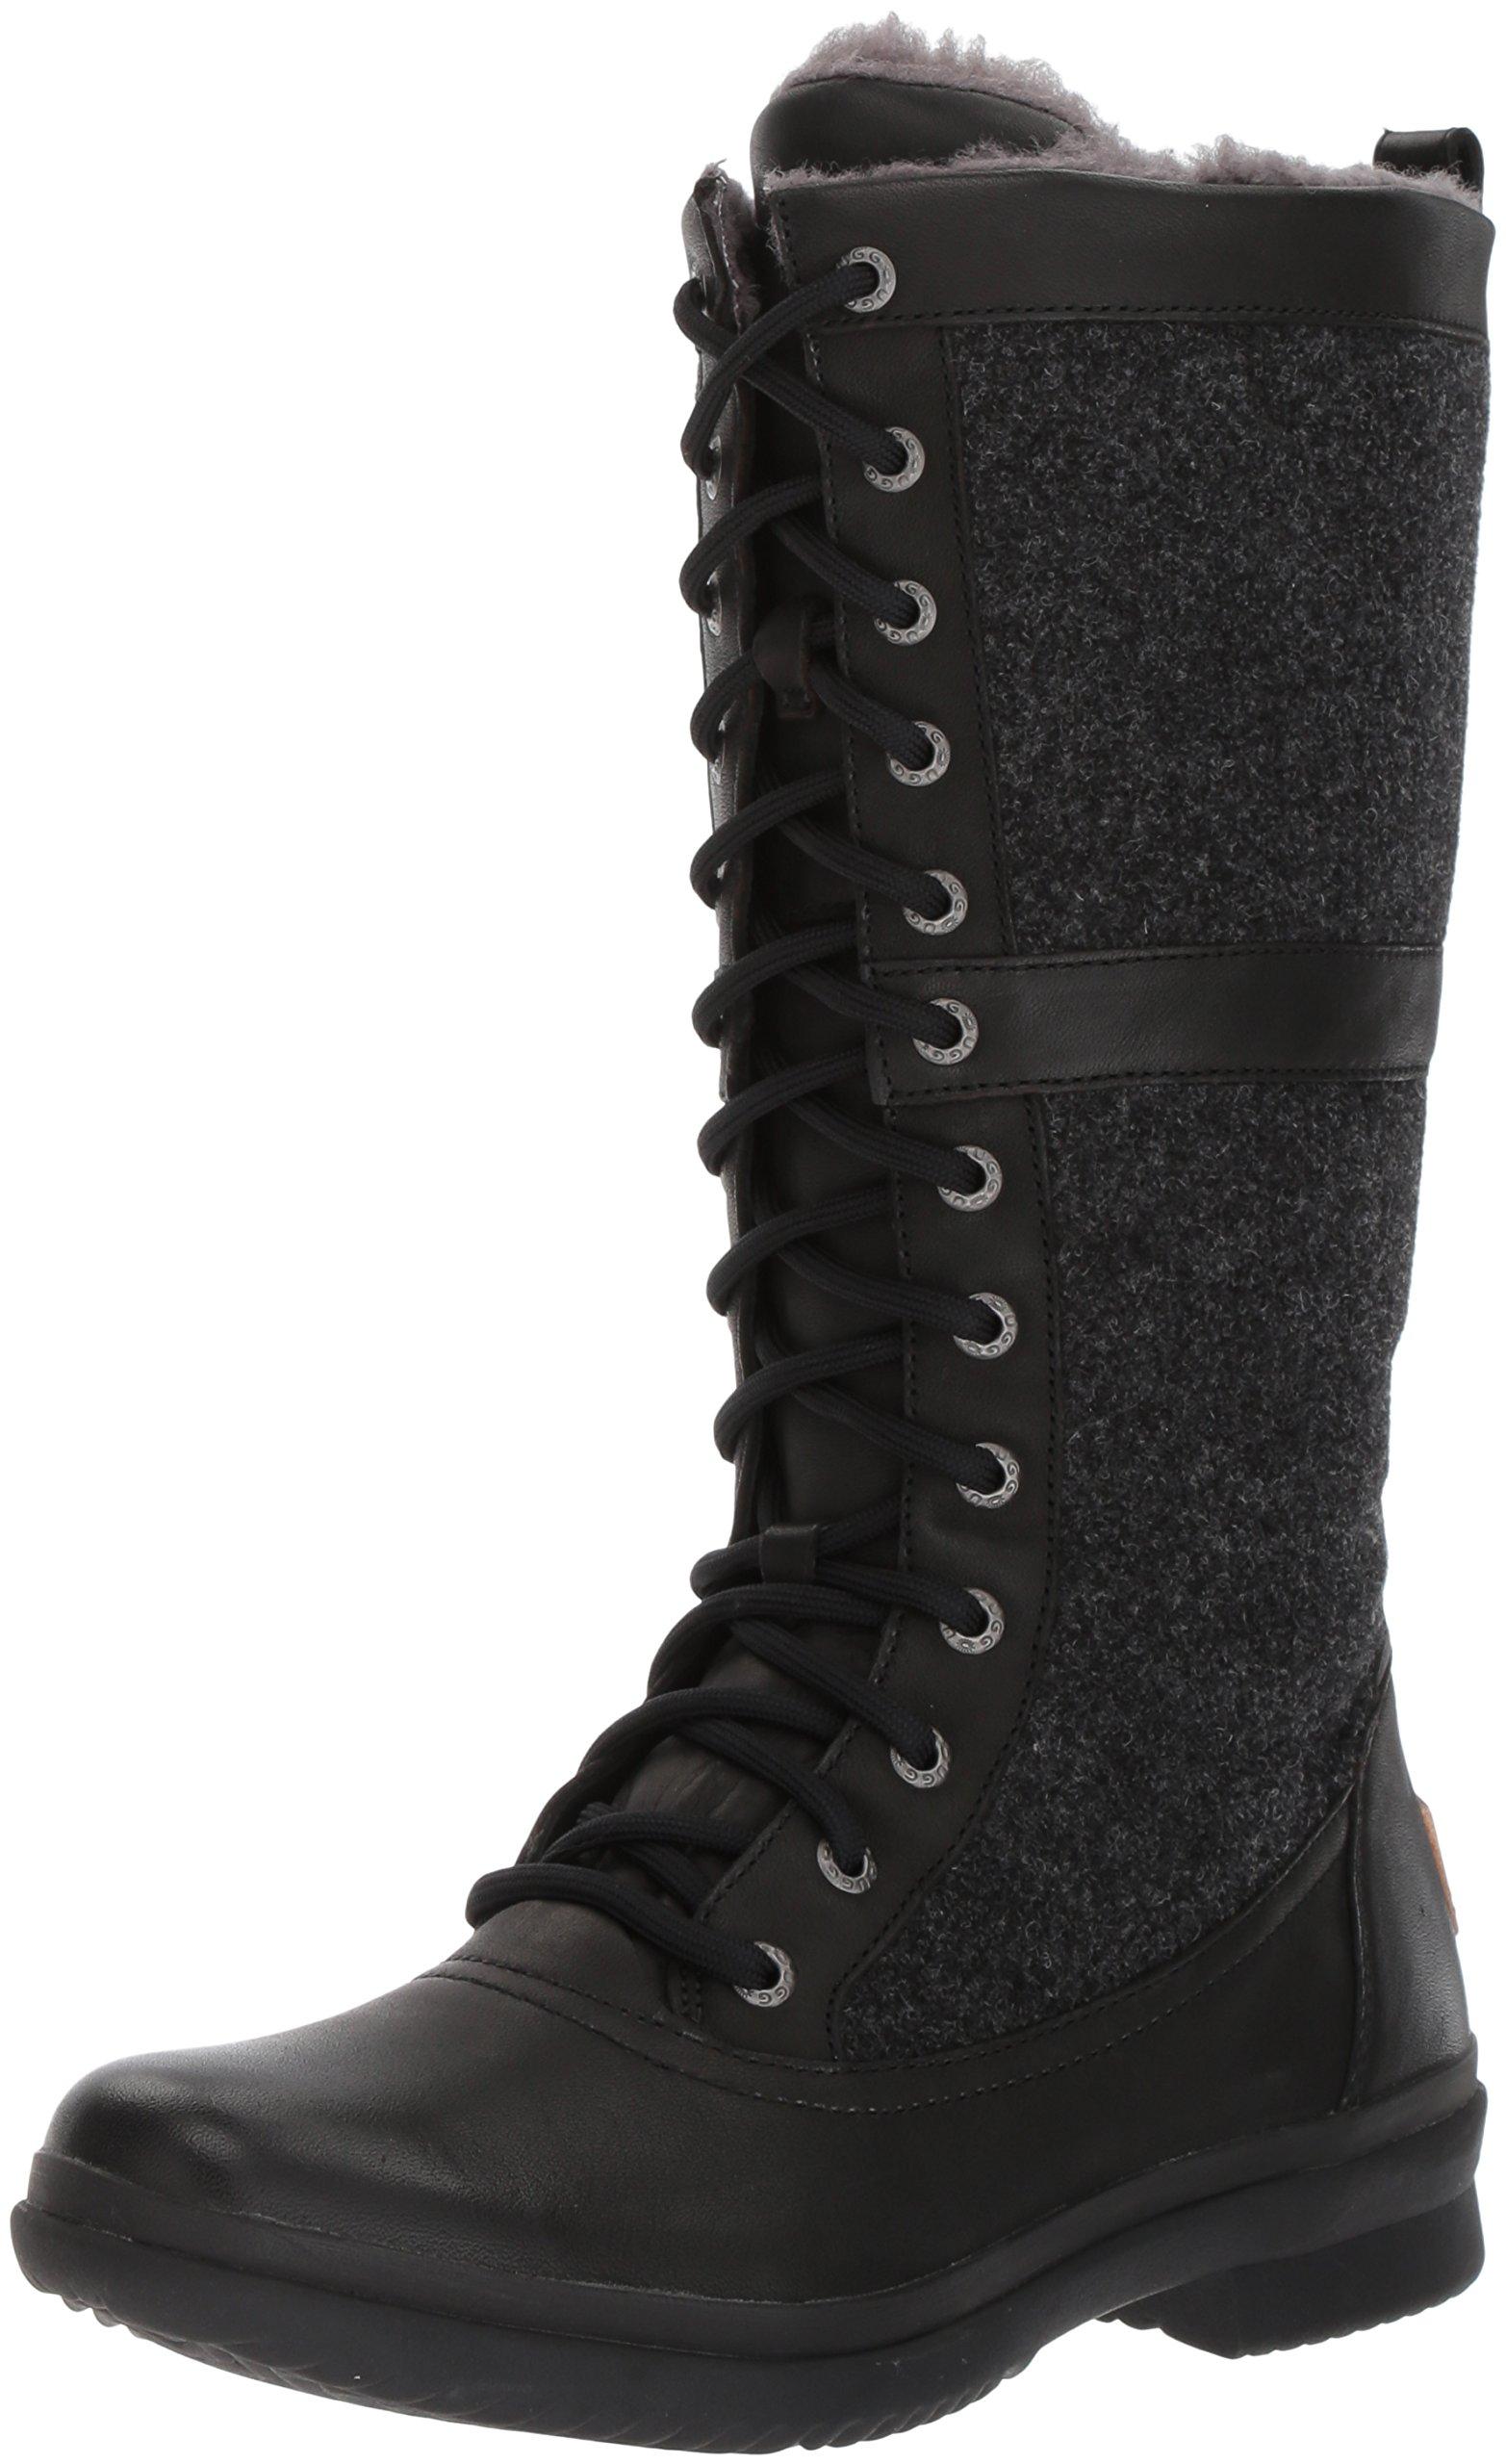 UGG Women's Elvia Boot, Black, 12 M US